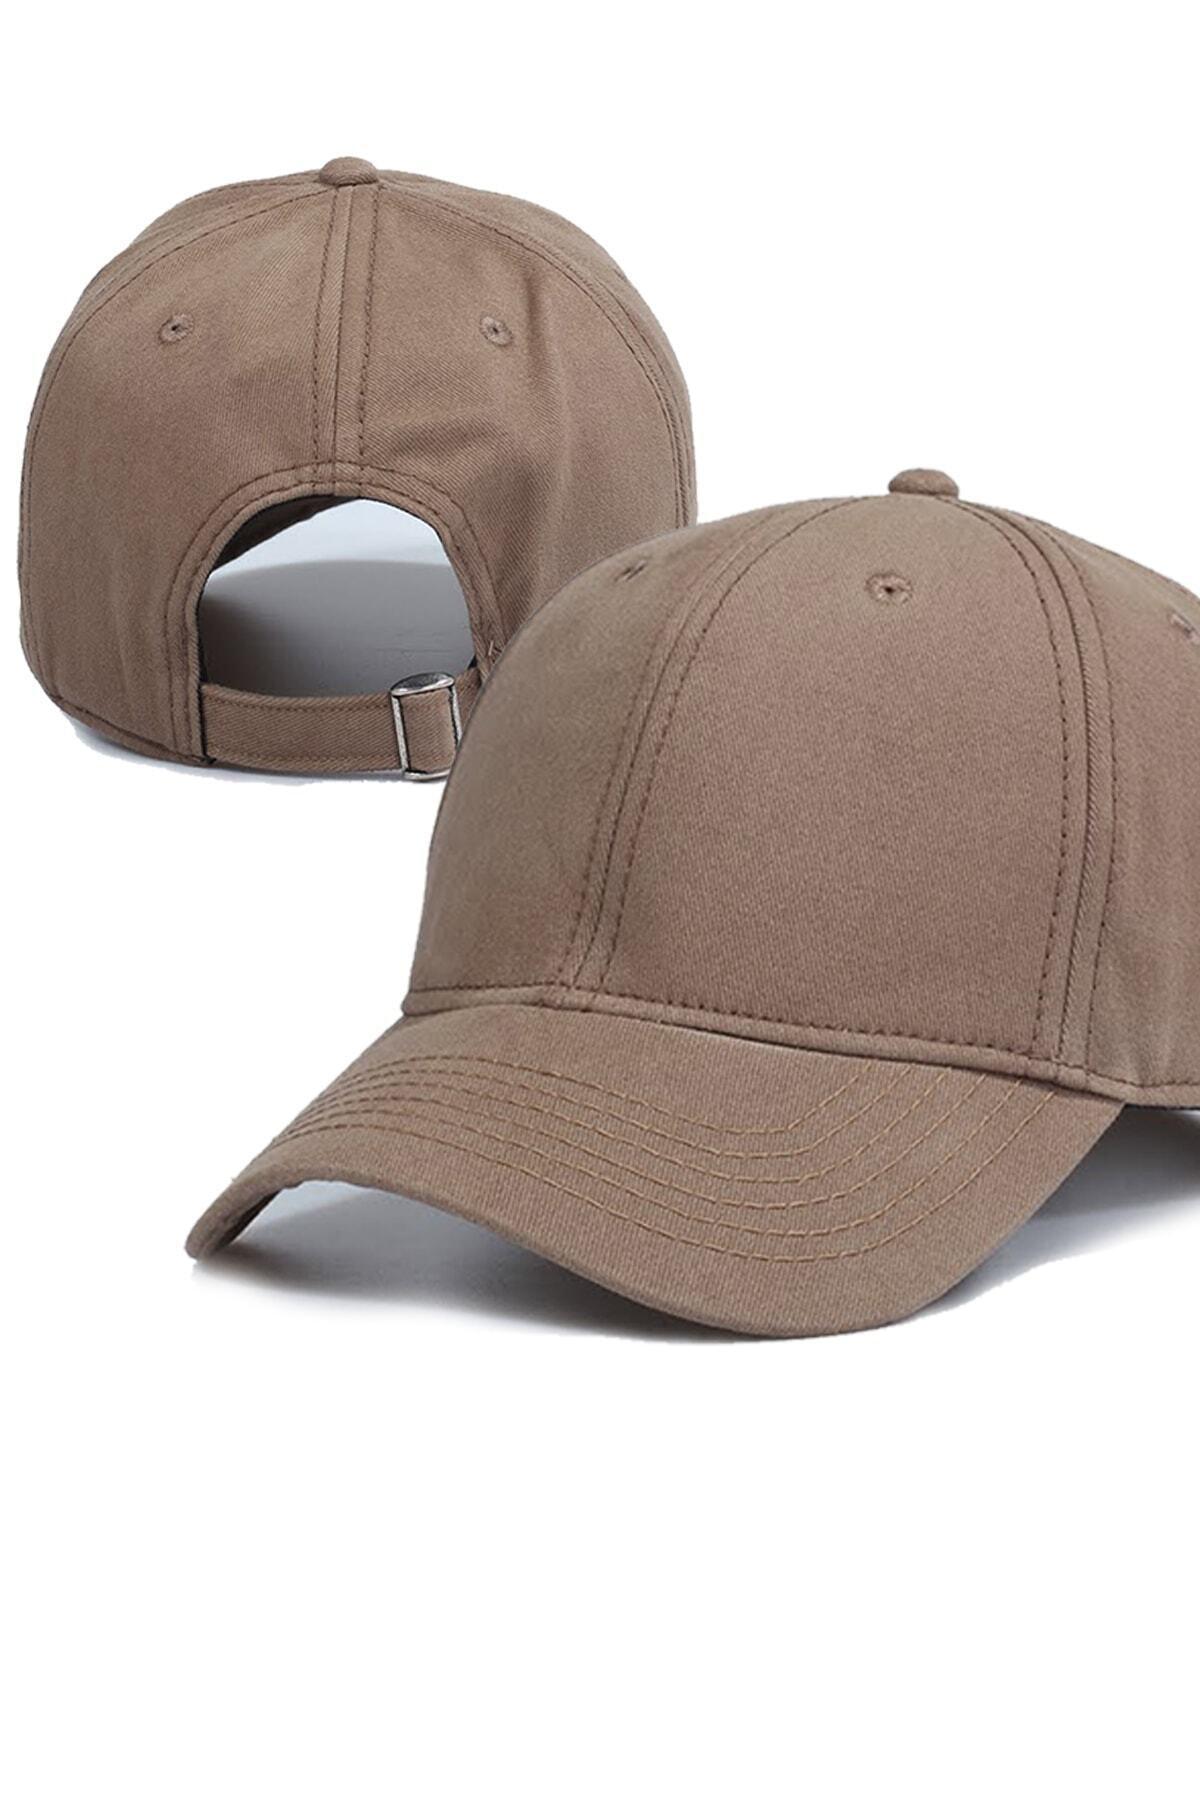 Yeni Sezon Pamuklu Yazlık Bej Şapka Unisex Snapback Trend Şapka